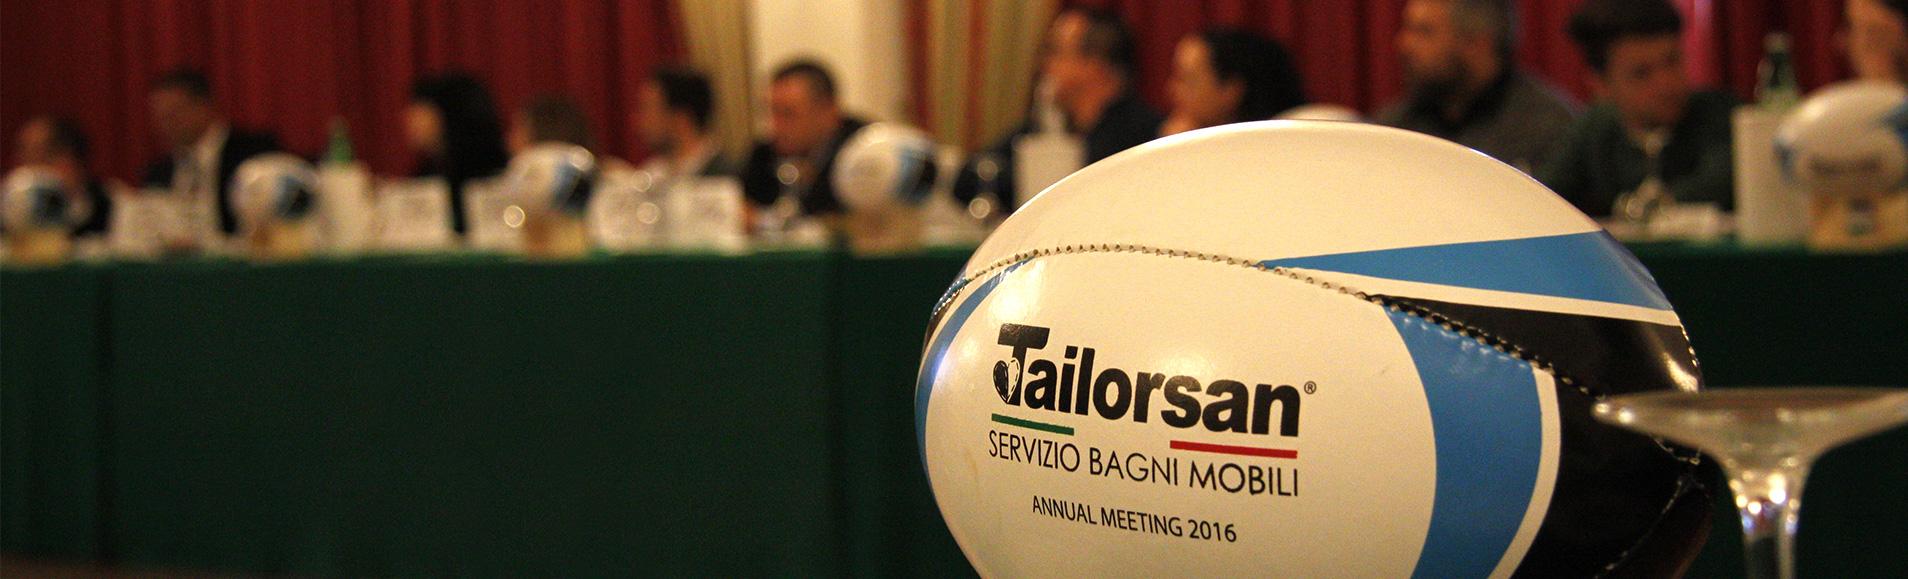 Convention 2016 tailorsan bagni chimici tailorsan - Noleggio bagni chimici firenze ...